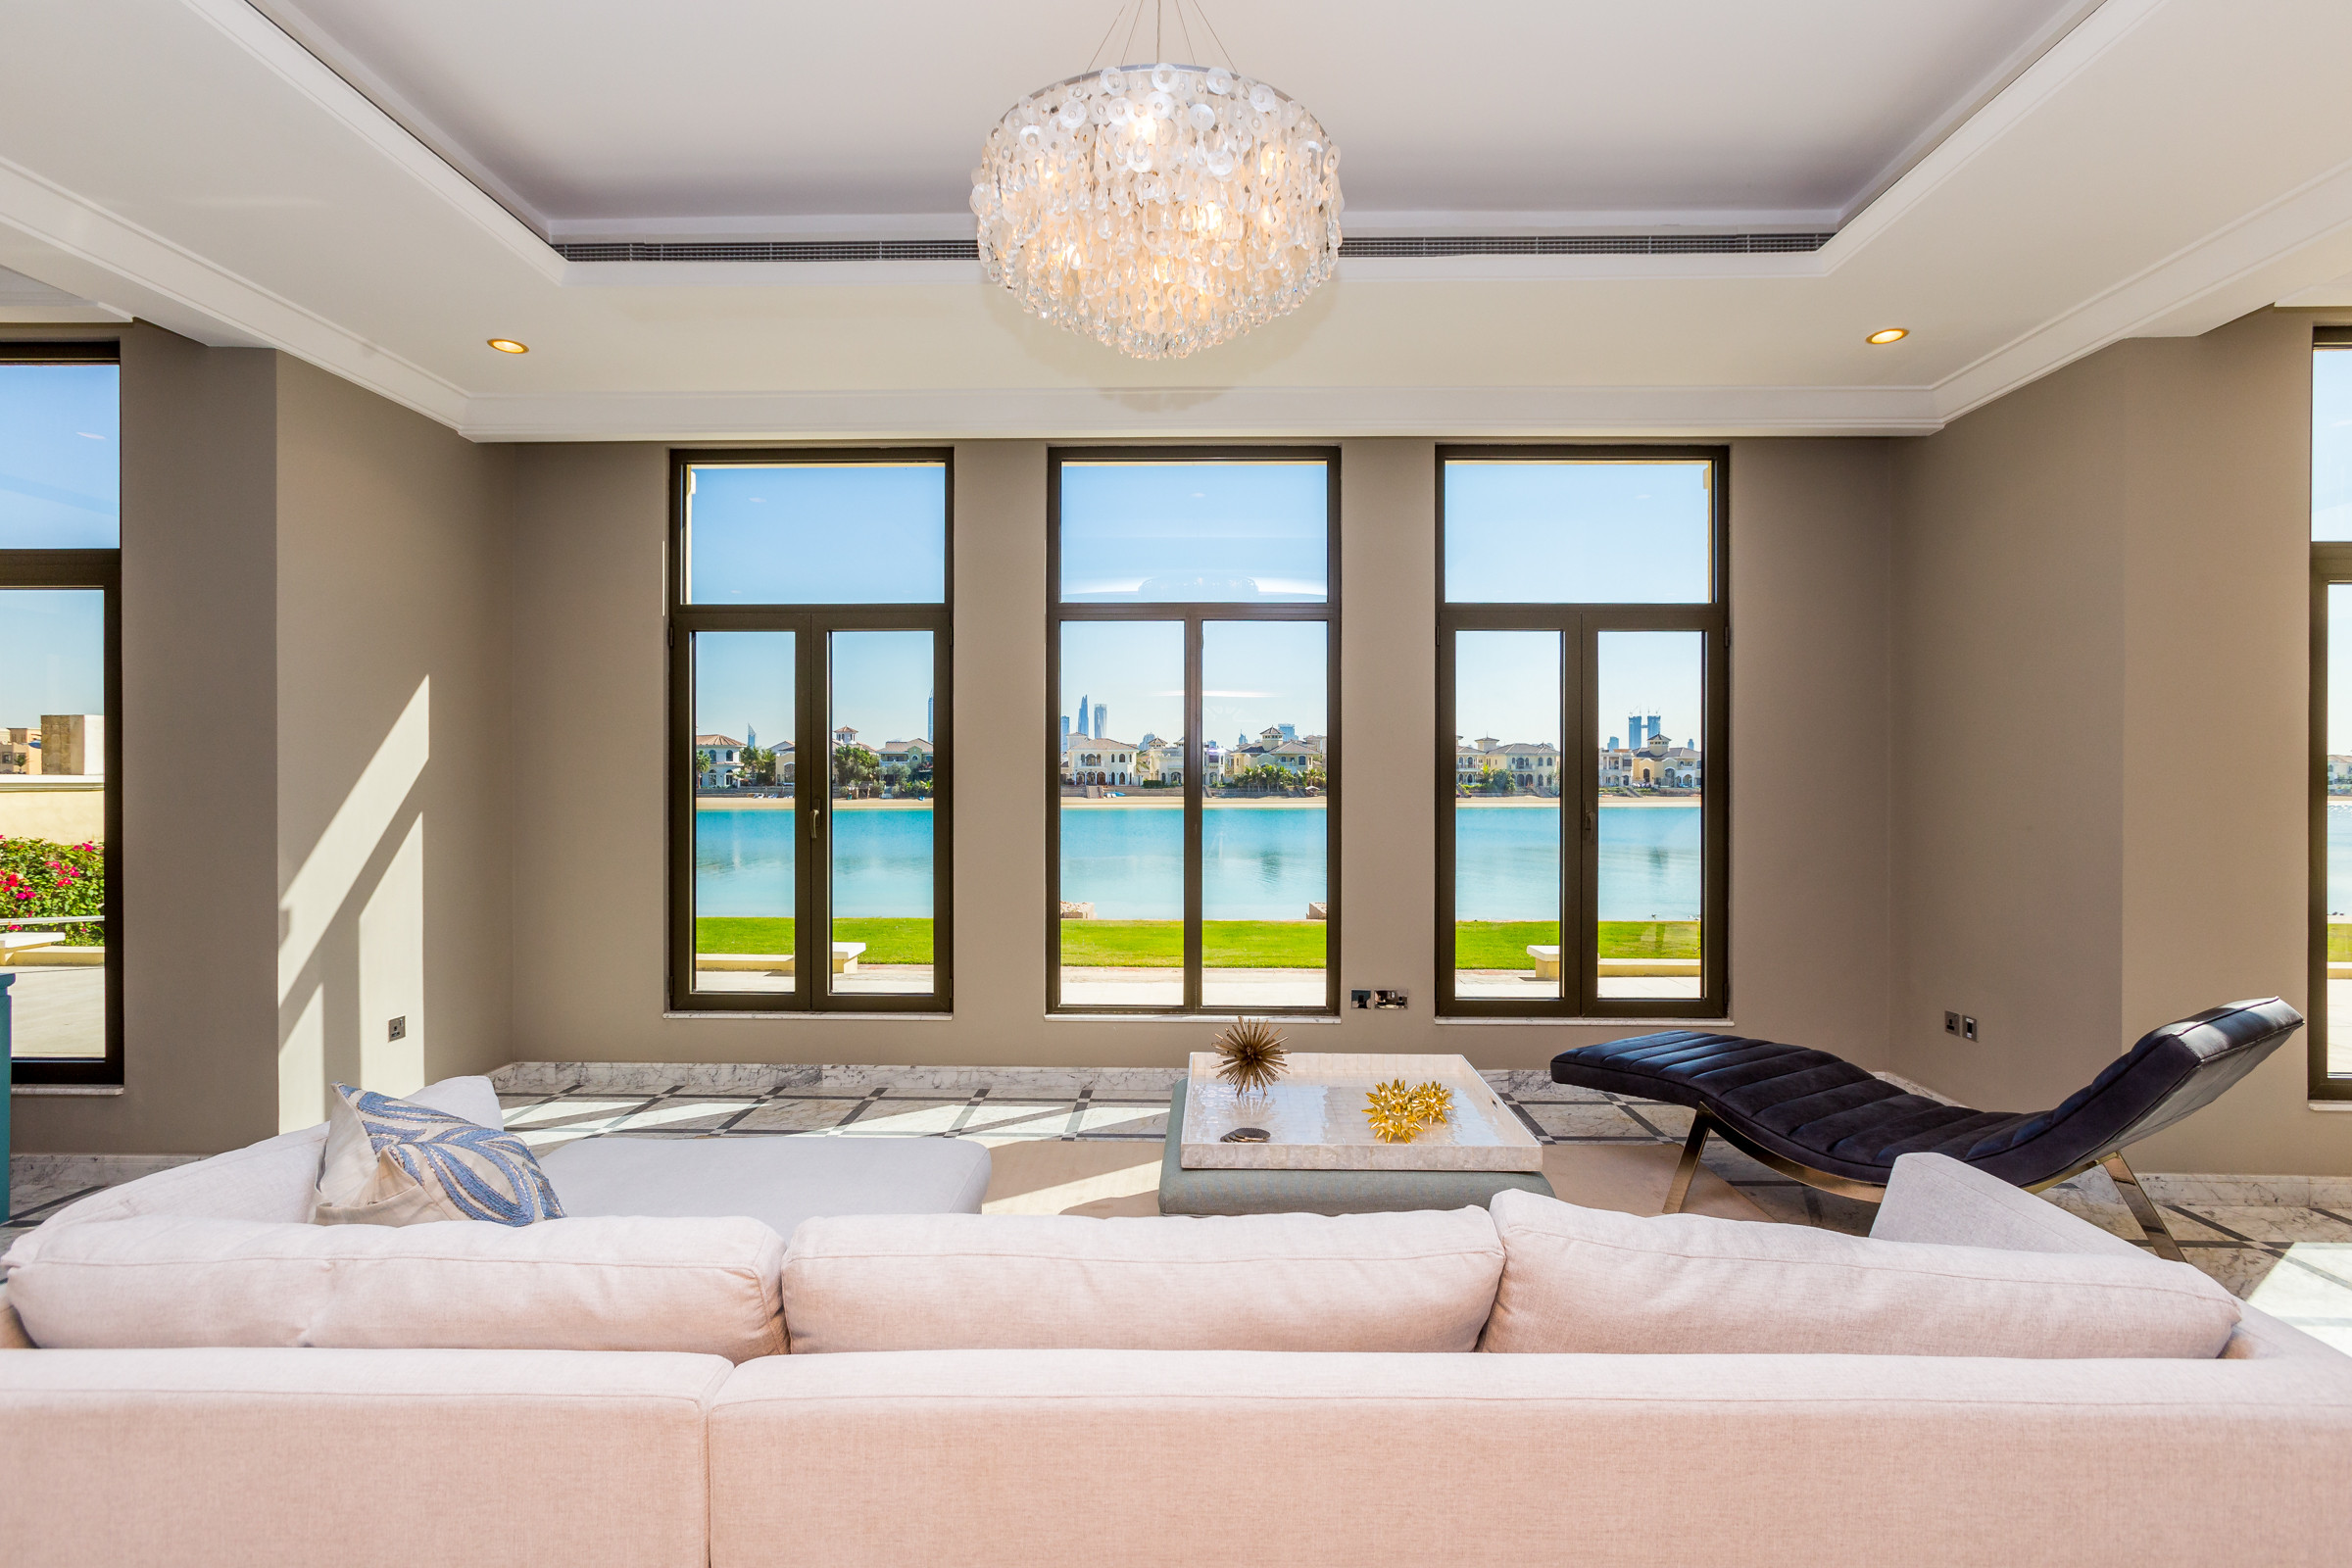 Dubai Holiday Villas